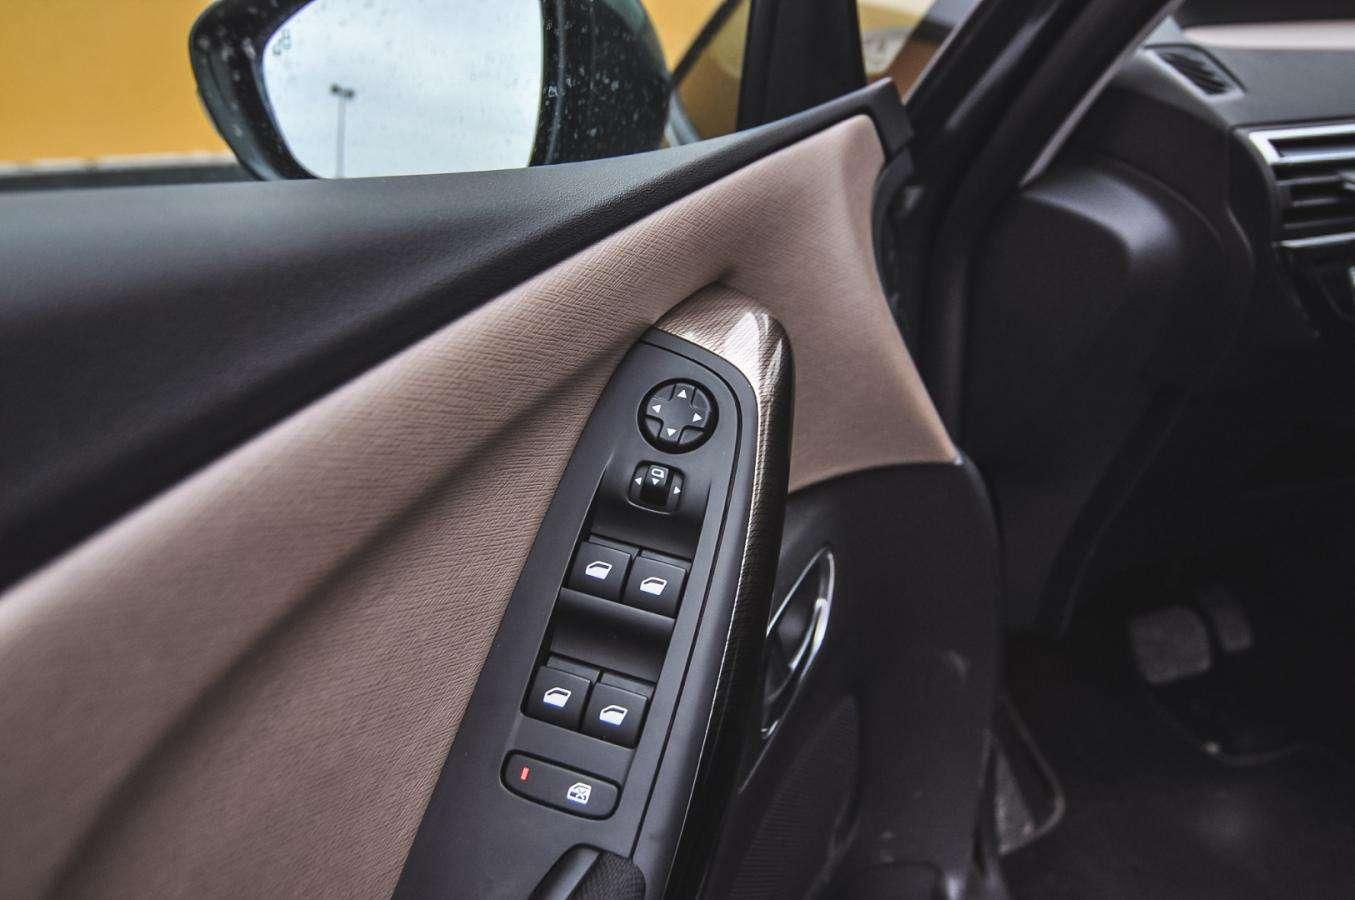 citroen grand c4 picasso 2 0 bluehdi futurystyczny minivan. Black Bedroom Furniture Sets. Home Design Ideas